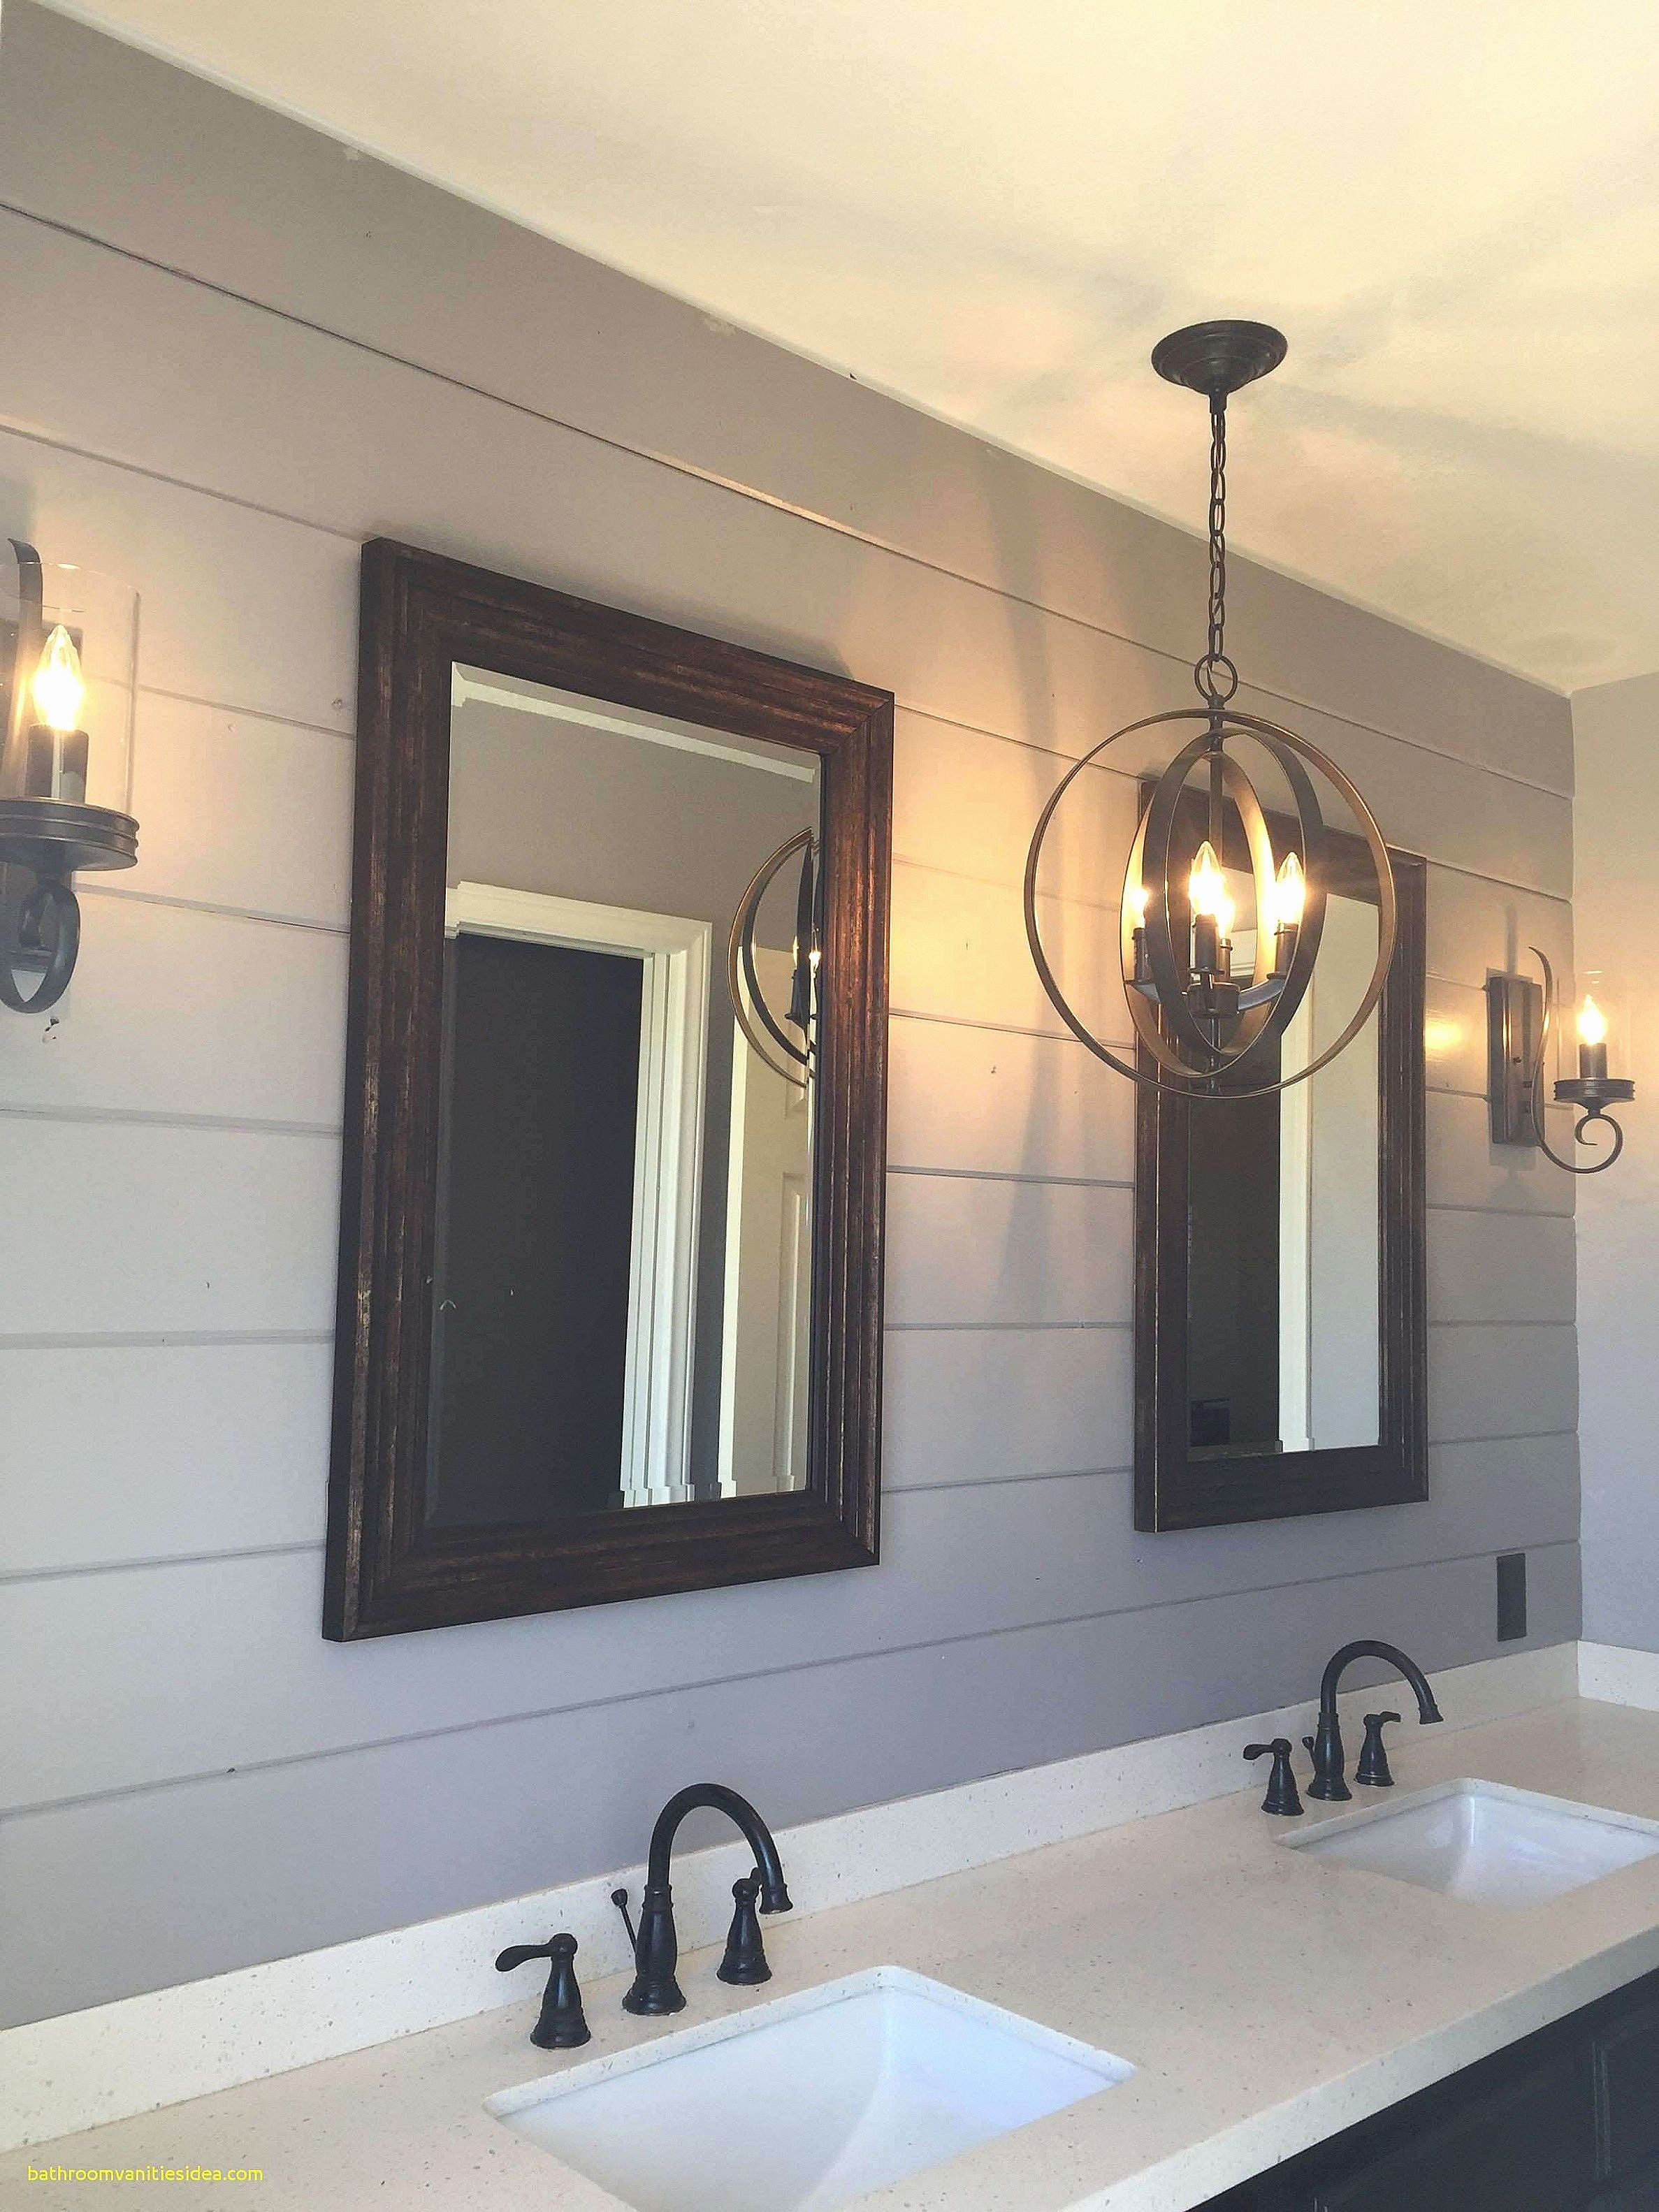 Luxury Bathroom Design Ideas With Pedestal Sink Bathroomdesign Bathroomdesignideas Bathroomdesignp Unique Bathroom Elegant Bathroom Bathroom Design Luxury